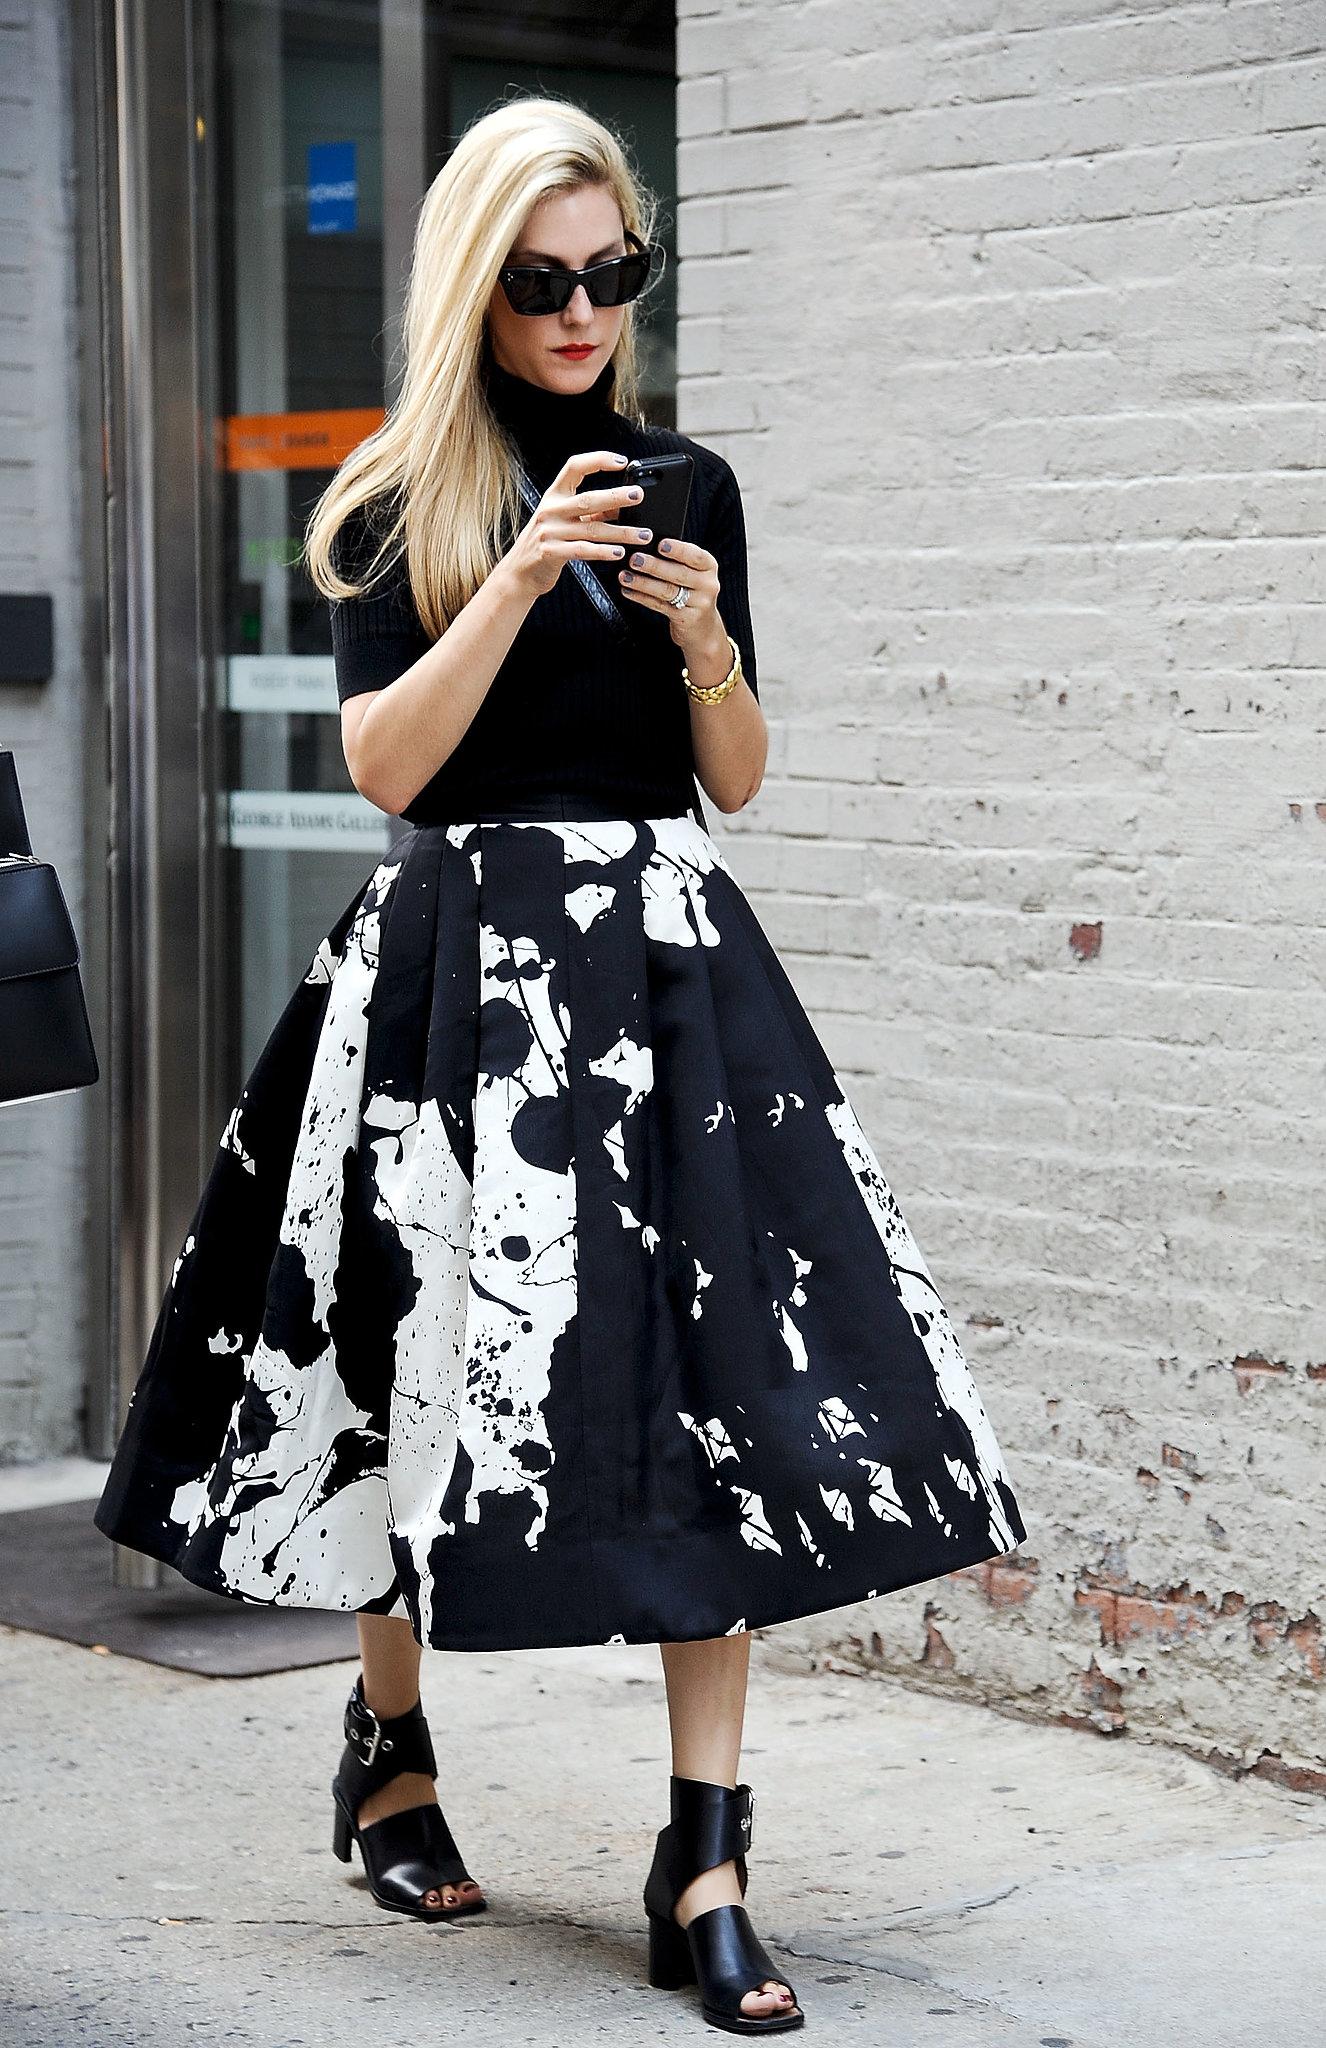 Joanna Hillman made ladylike look so cool in a paint-splattered Tibi Resort 2014 skirt.